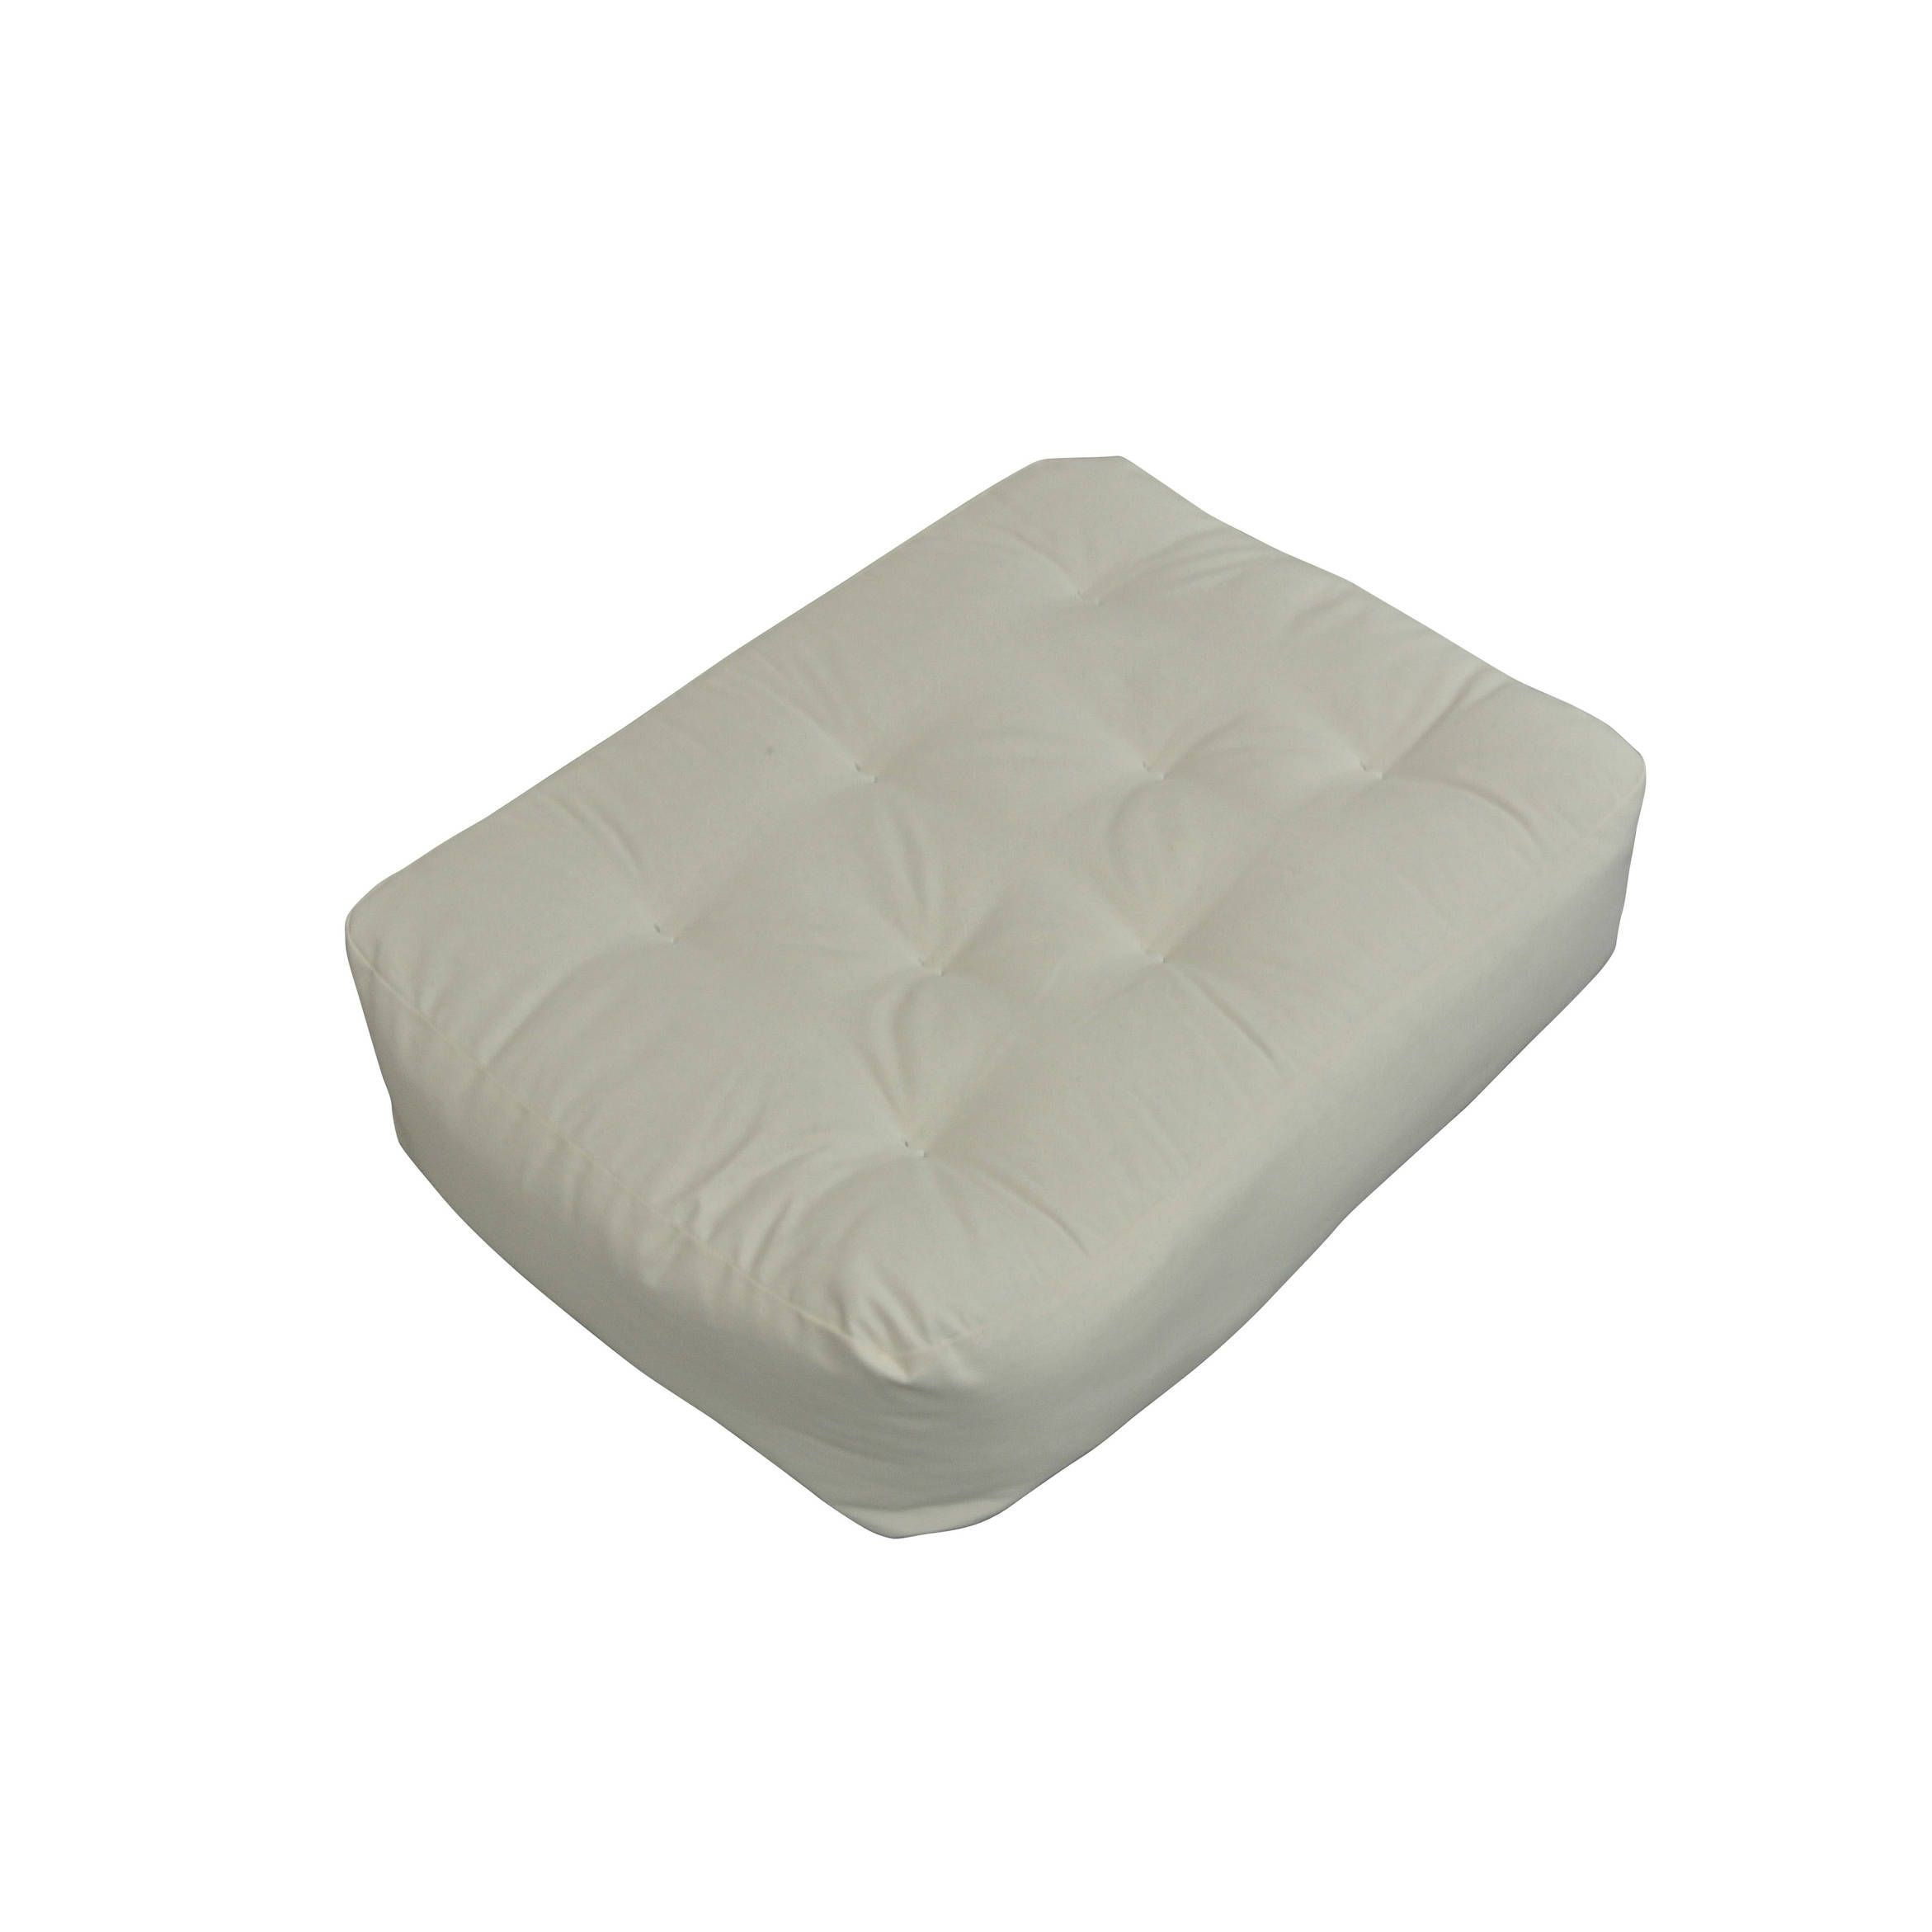 9 moonlight 21x28 chair ottoman natural futon mattress  natural   polyester blend foam  9 moonlight 21x28 chair ottoman natural futon mattress  natural      rh   pinterest